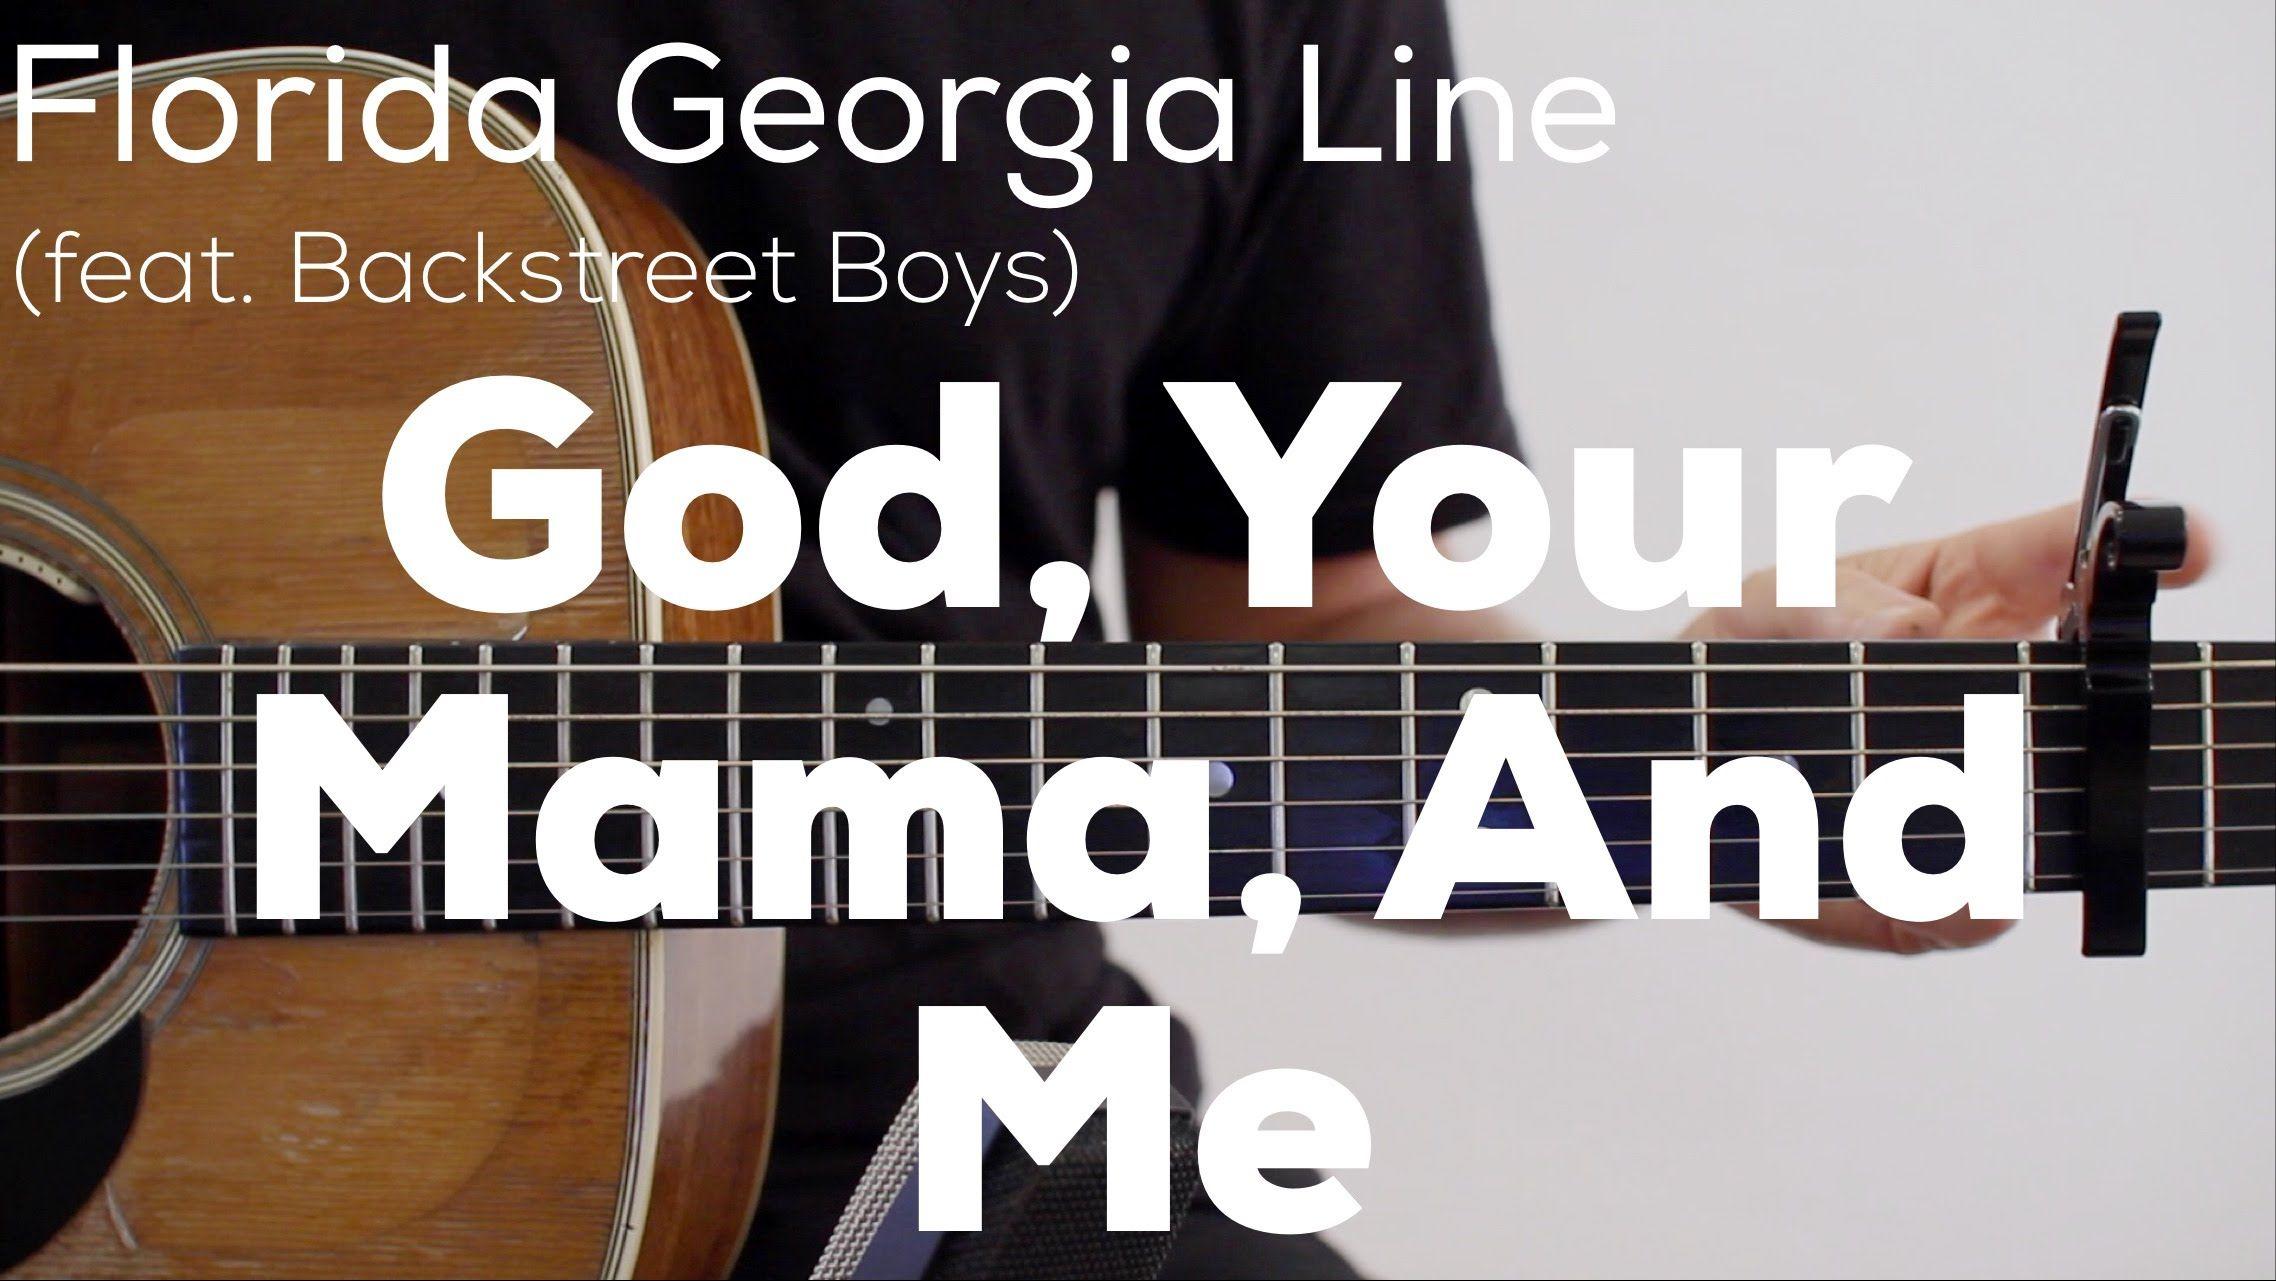 God Your Mama Me Florida Georgia Line Ft Backstreet Boys 2017 New English Video Song Download Florida Georgia Line Florida Georgia Backstreet Boys